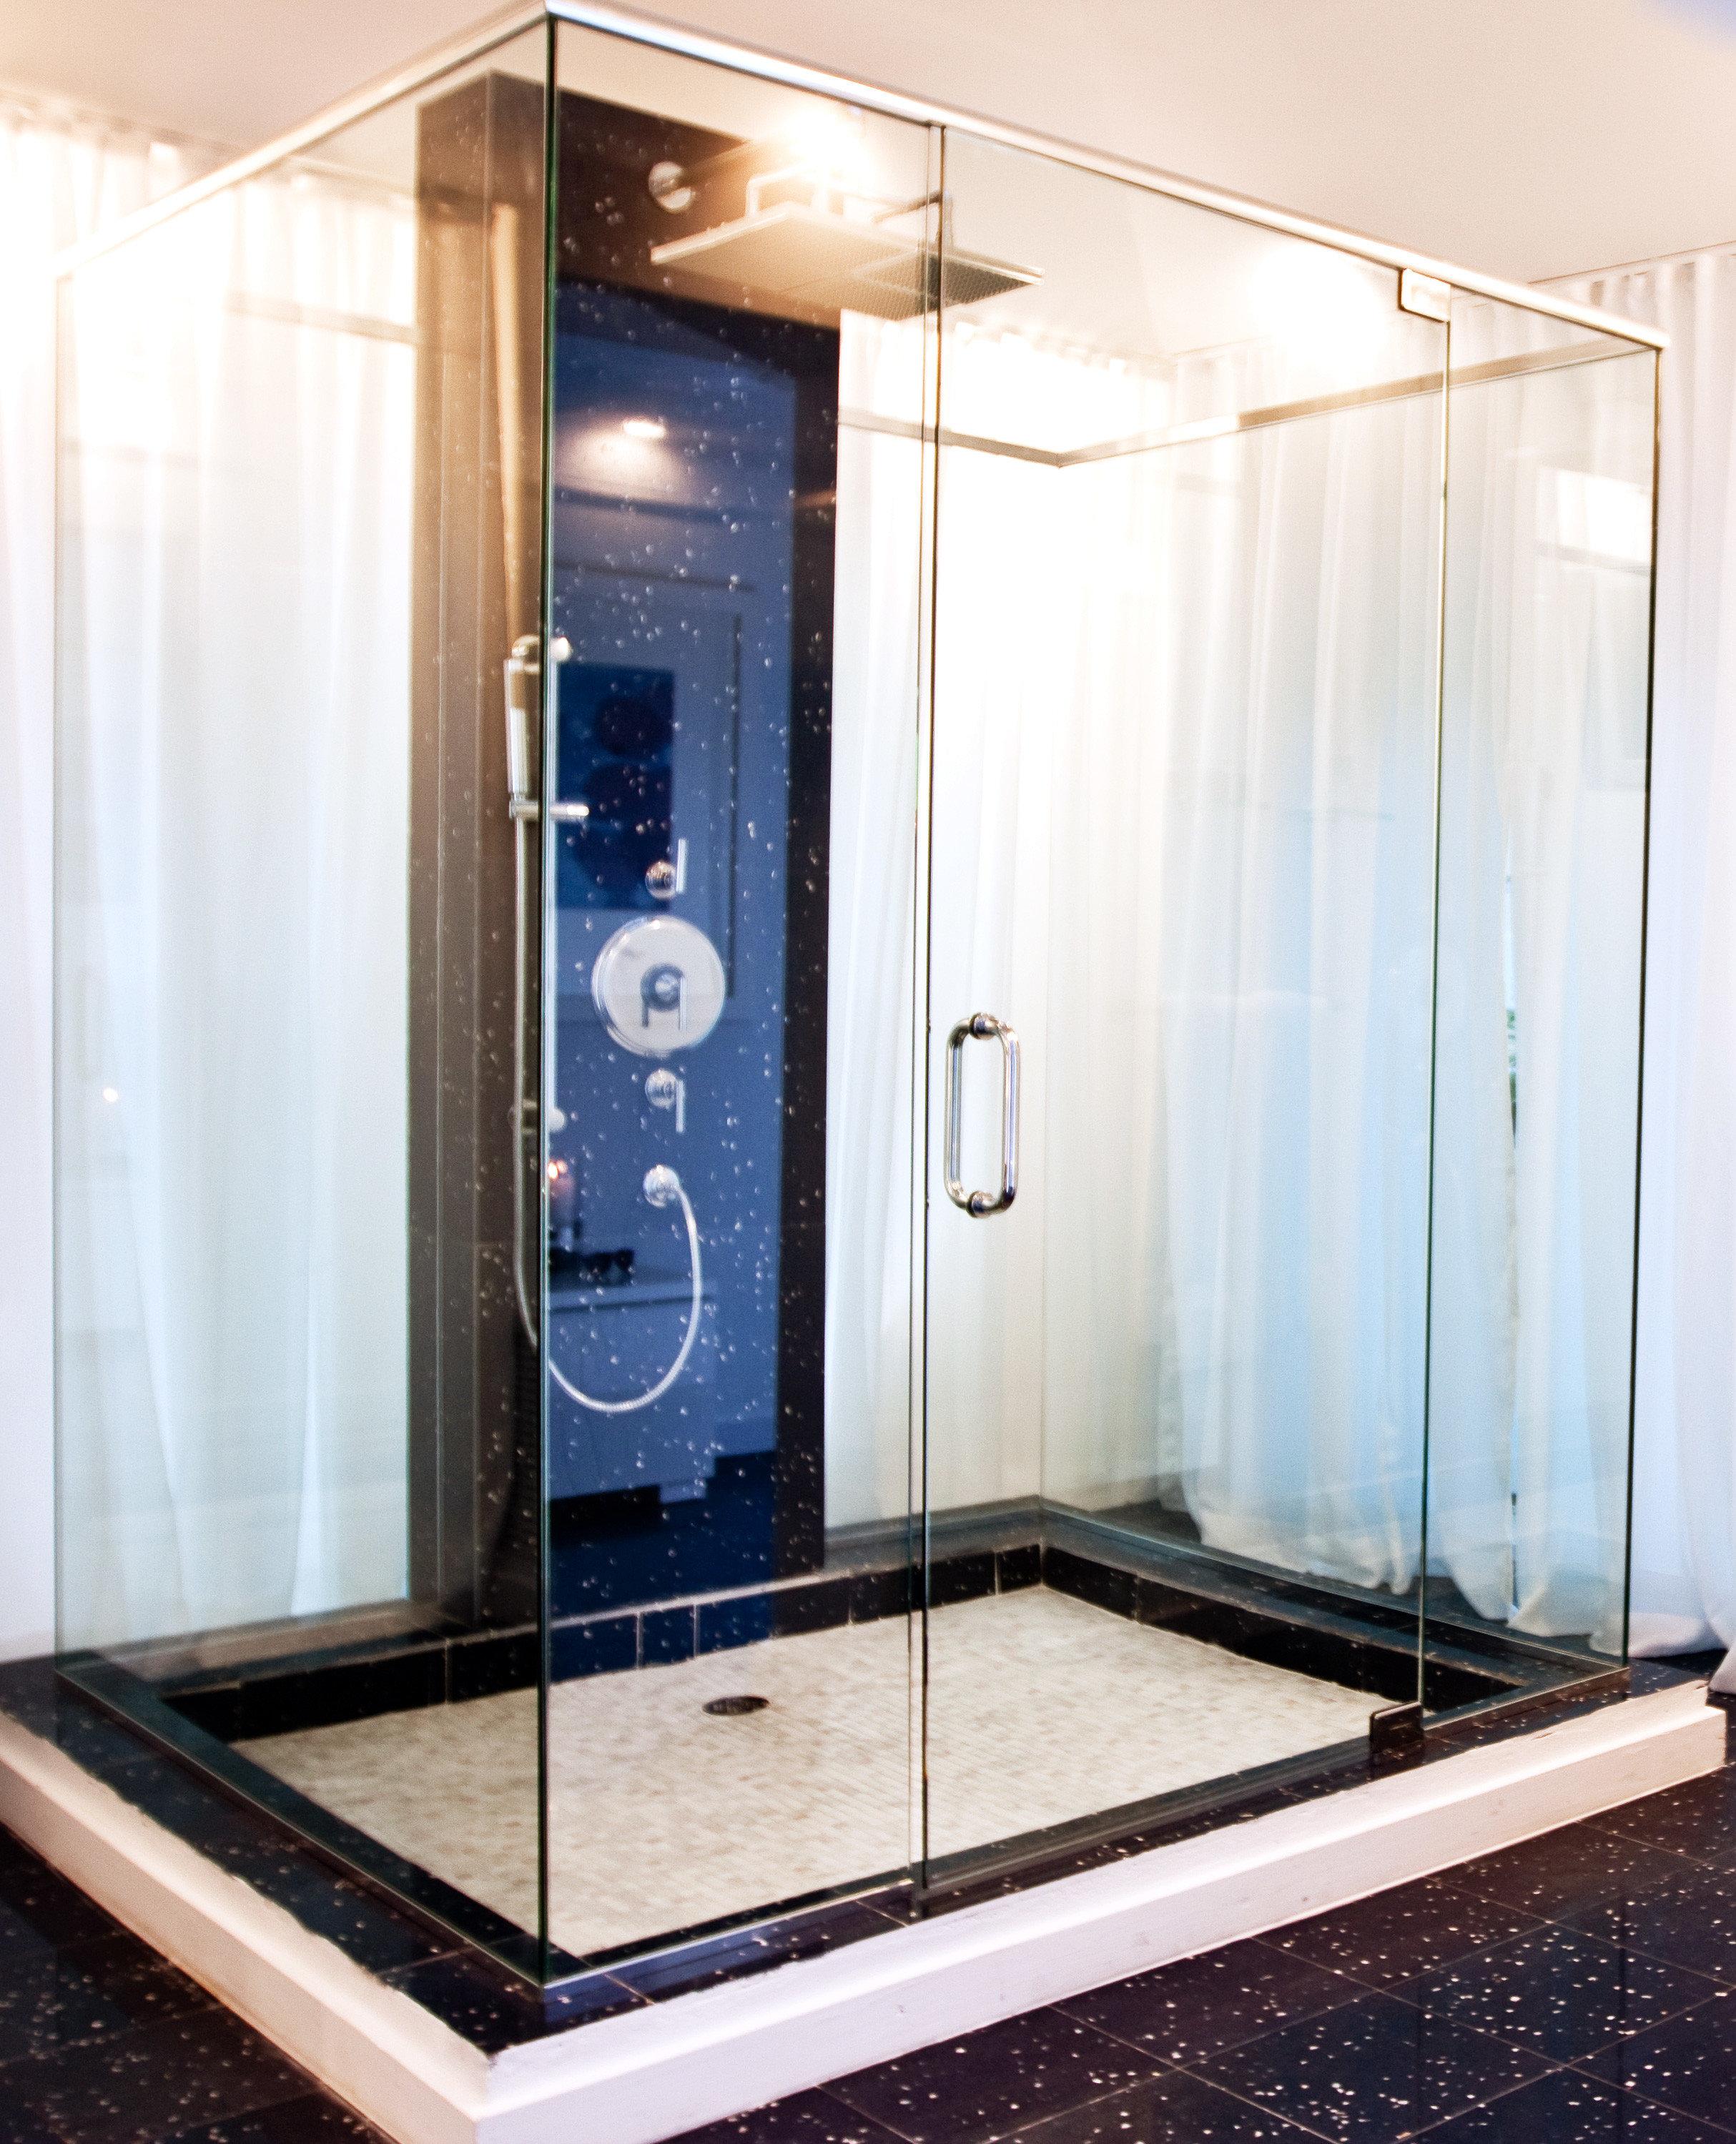 Bath Elegant Luxury plumbing fixture bathroom shower swimming pool sink counter public toilet bathtub